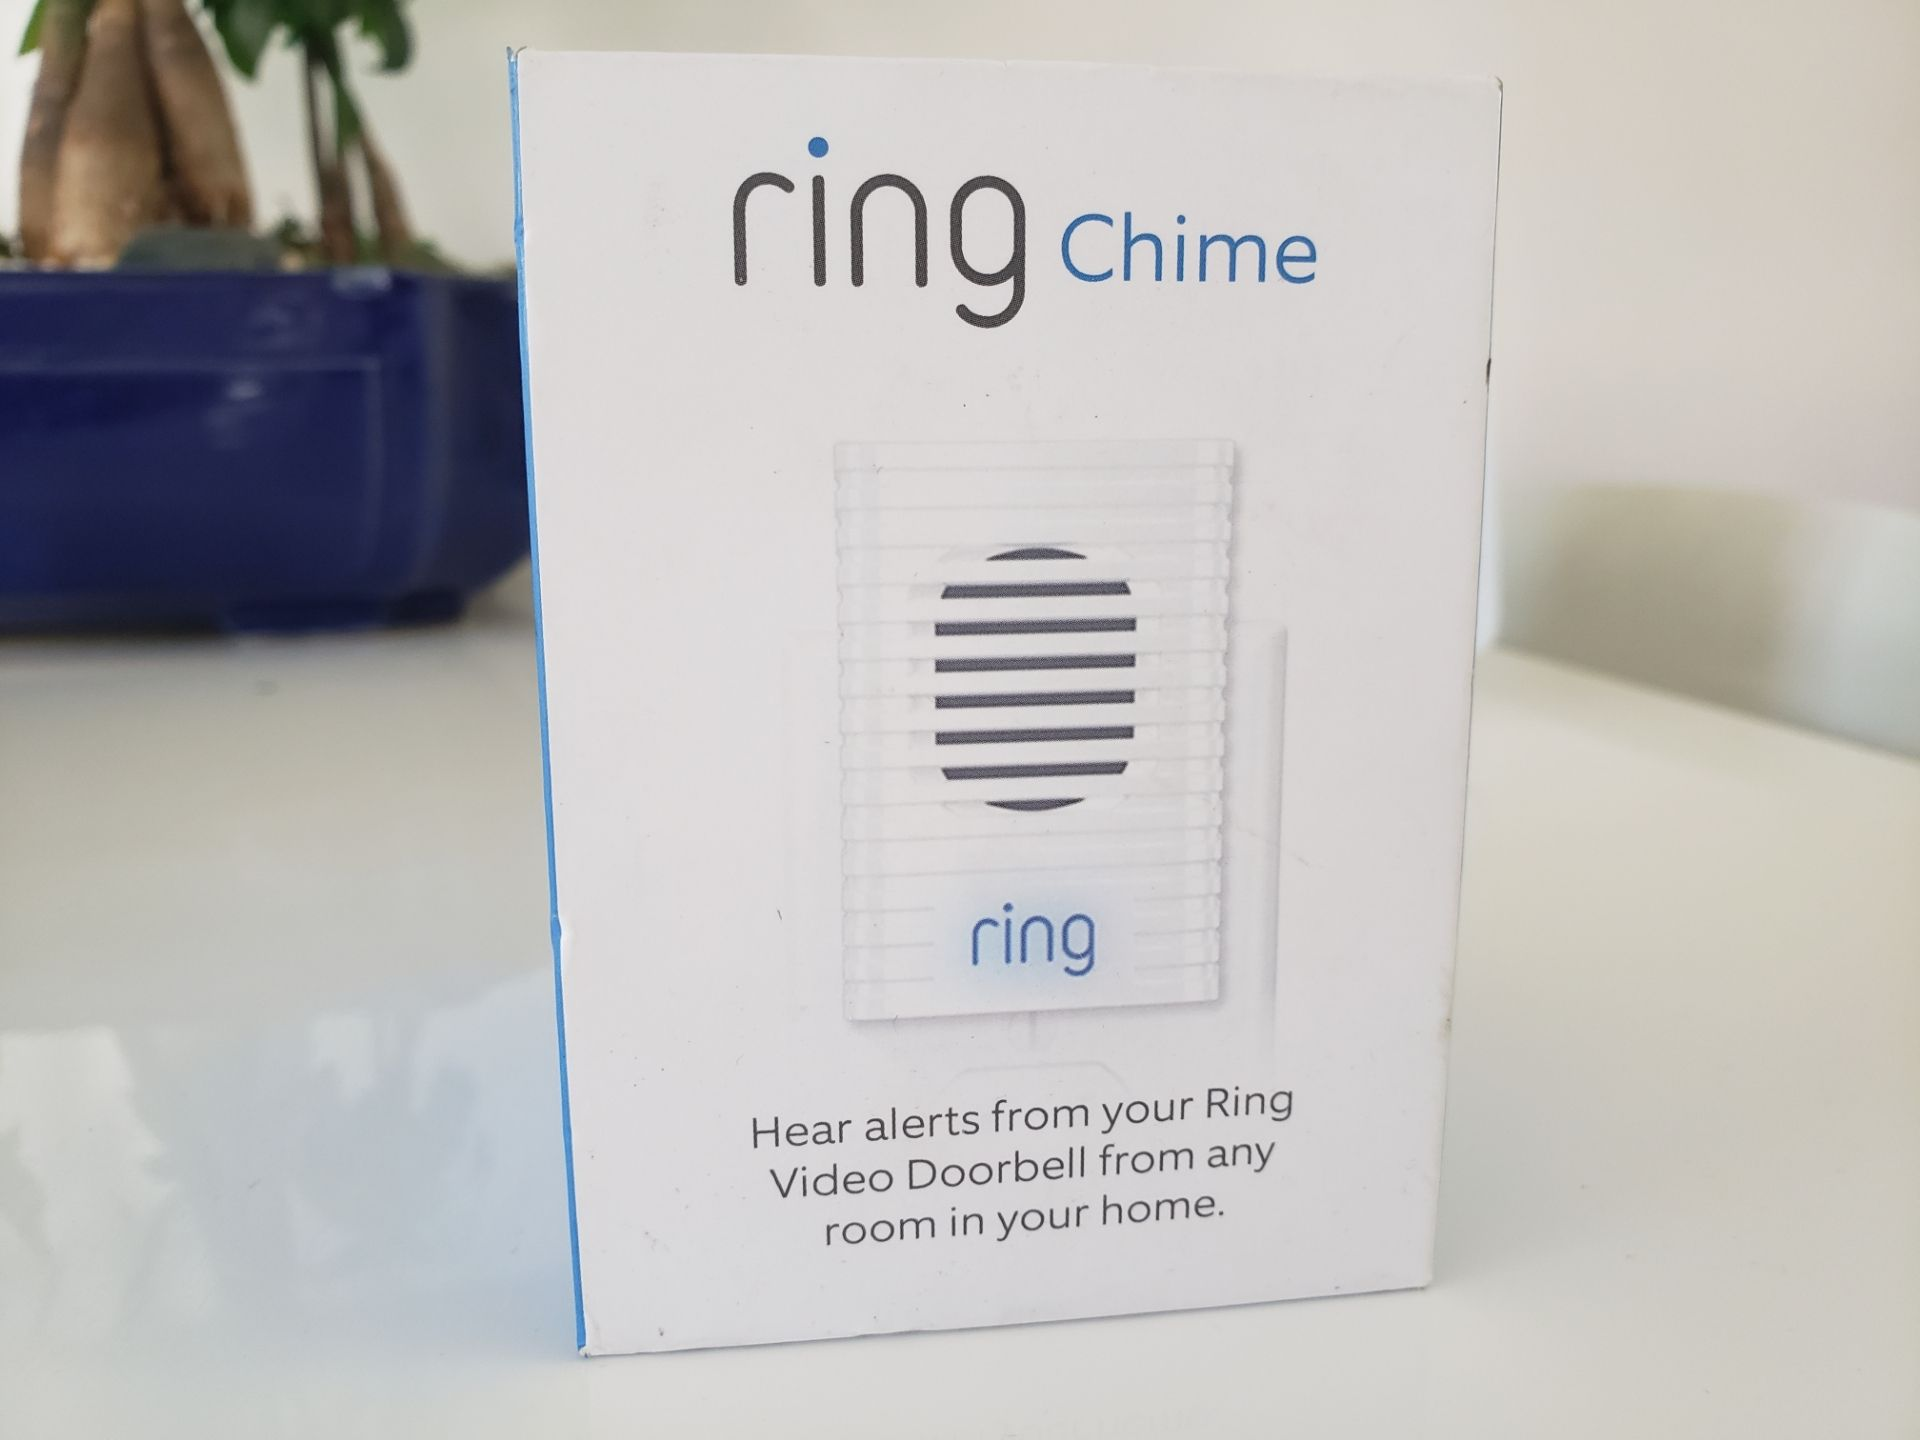 Ring Chime vs Ring Chime Pro: I like the Ring Chime better